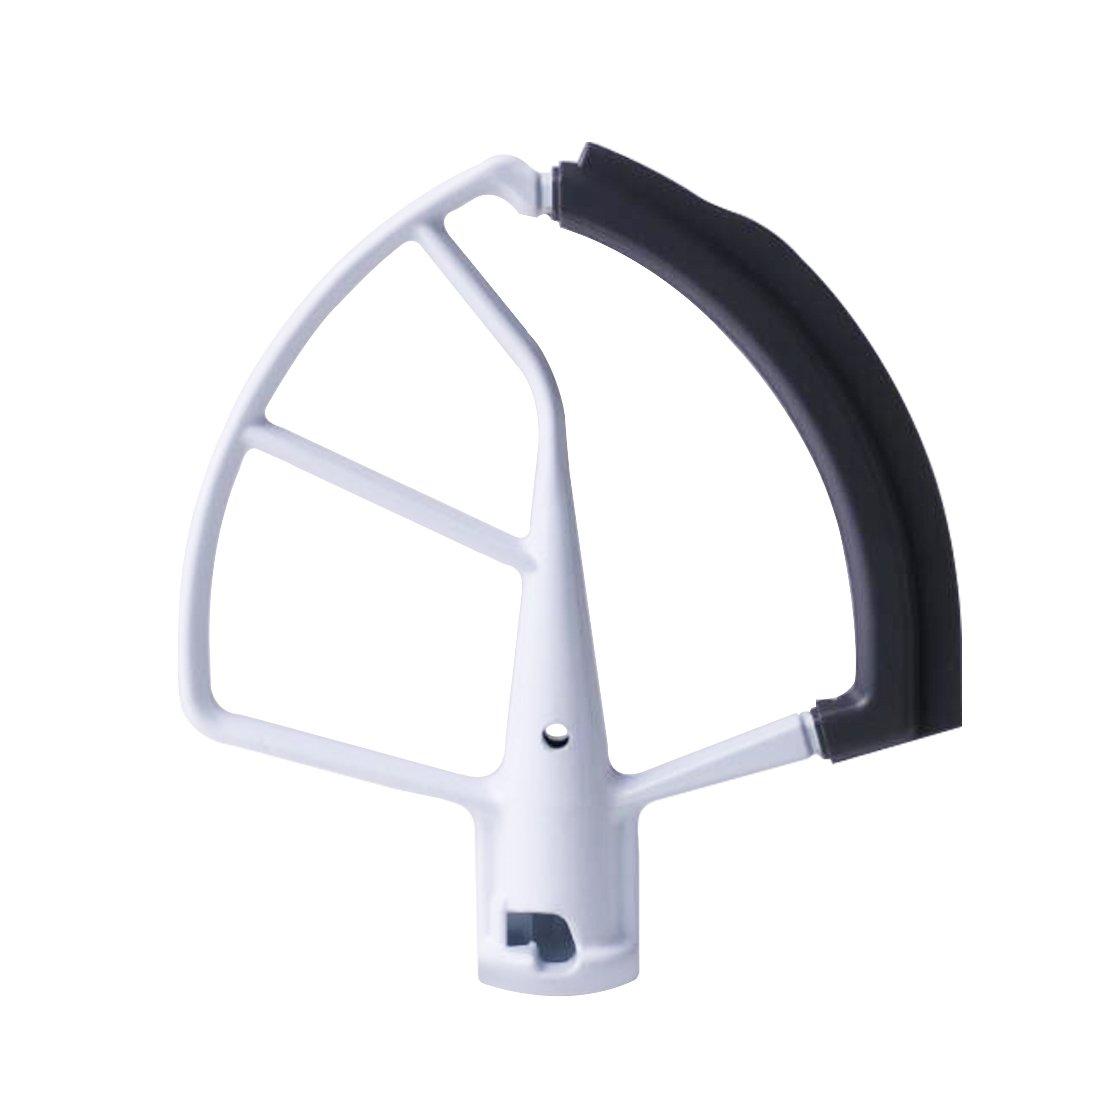 Flex Edge Beater for KitchenAid Mixer - Lift Stand Tilt-Head Mixers Attachment for 5.5 QT and 6 Quart Bowls - Bowl Scraper Blade Accessory White - By Flexpro